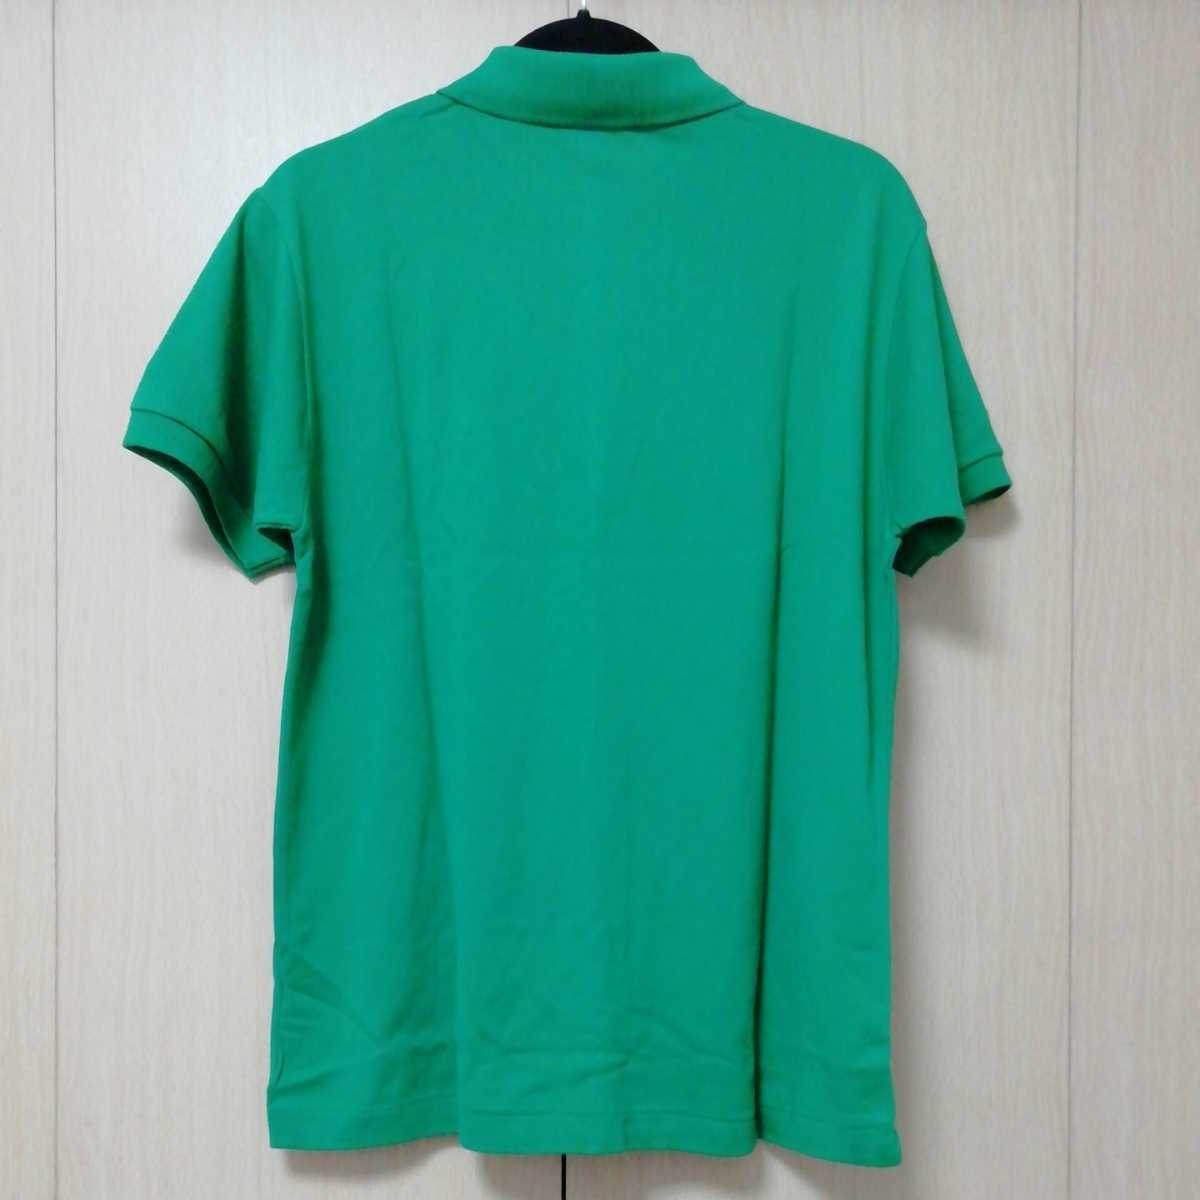 TRD 半袖ポロシャツ M